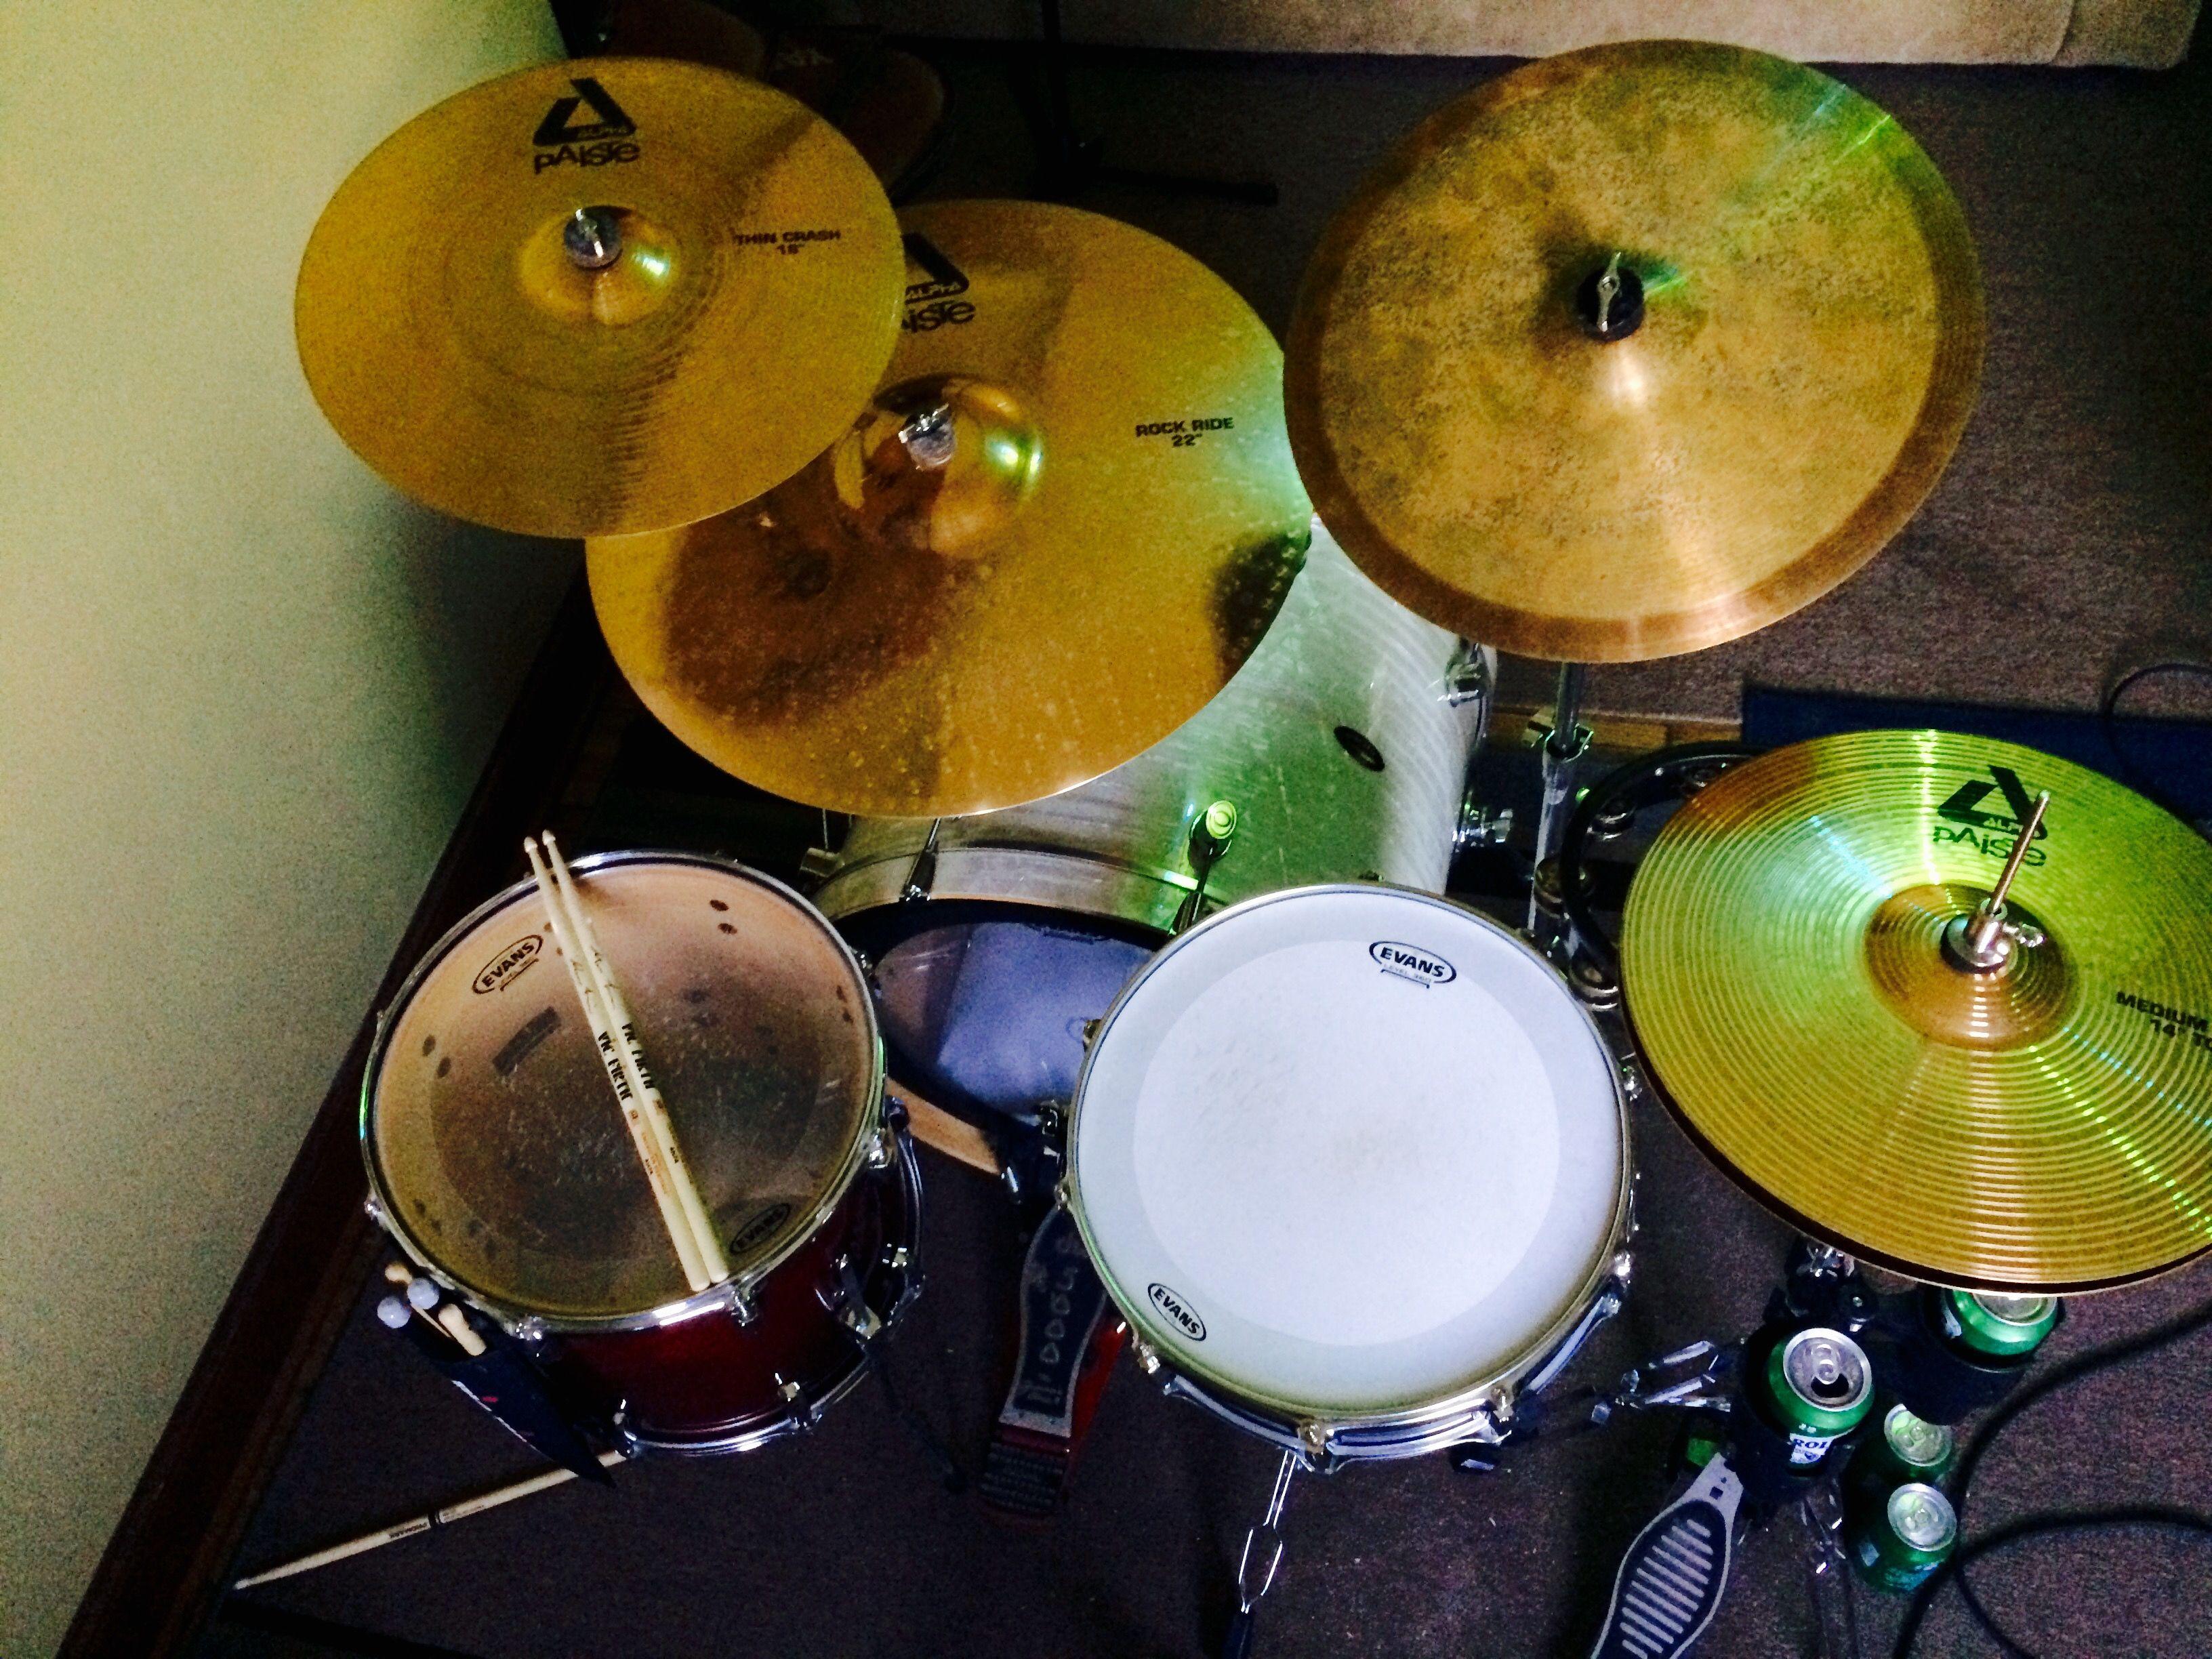 Bateria Musica Porno drum set/ minimal drum set/ paiste cymbals/ drum set pocket